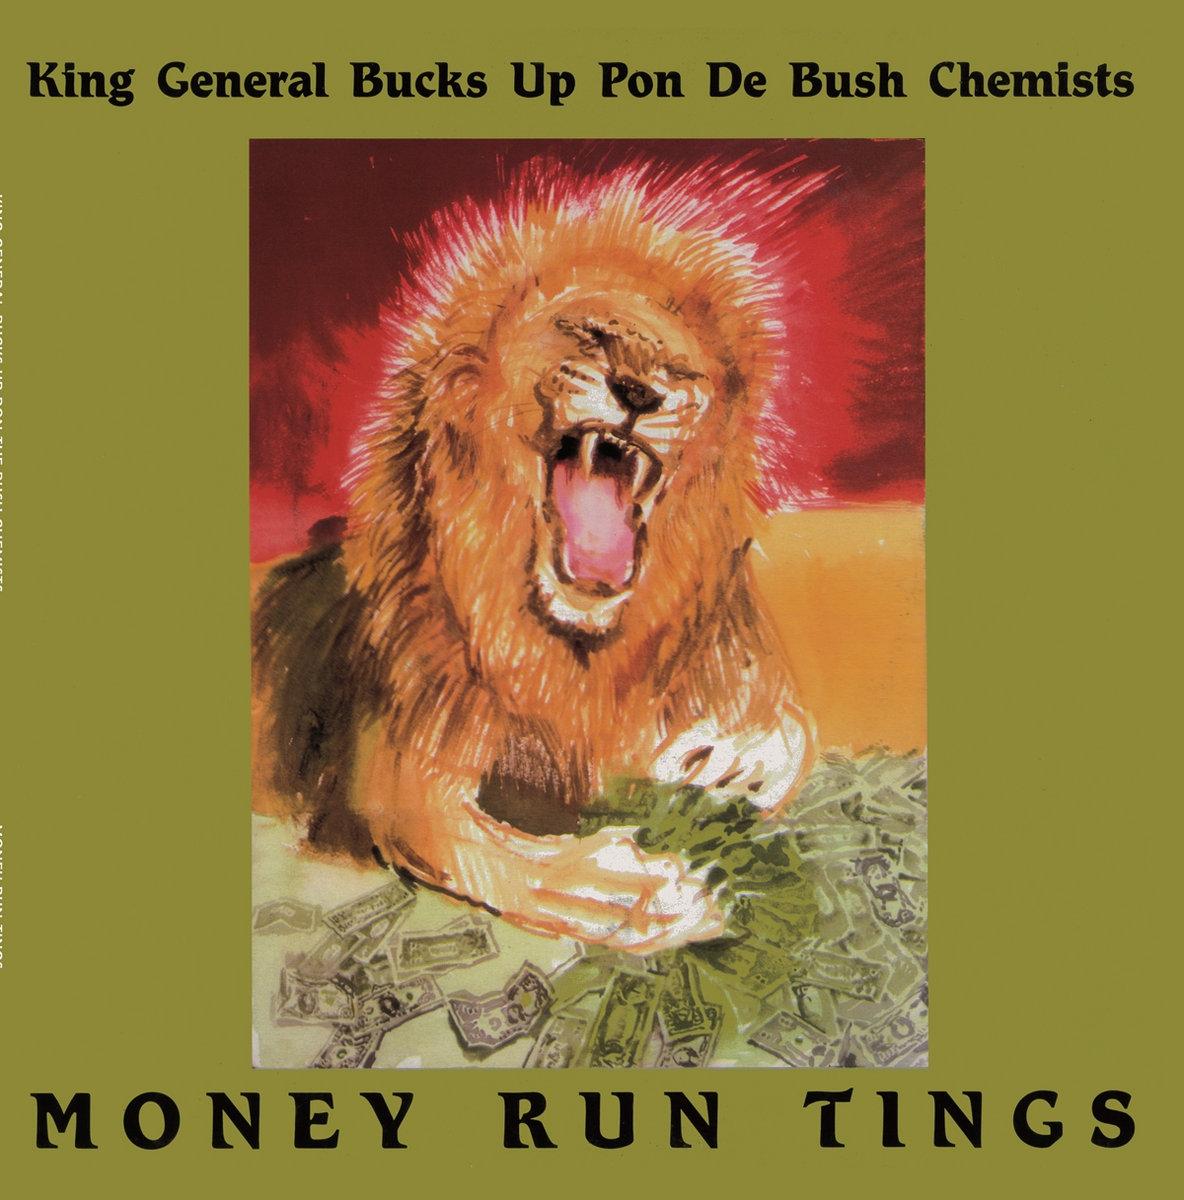 King General Bucks Up Pon Bush Chemists, The* De Bush Chemists - Money Run Tings